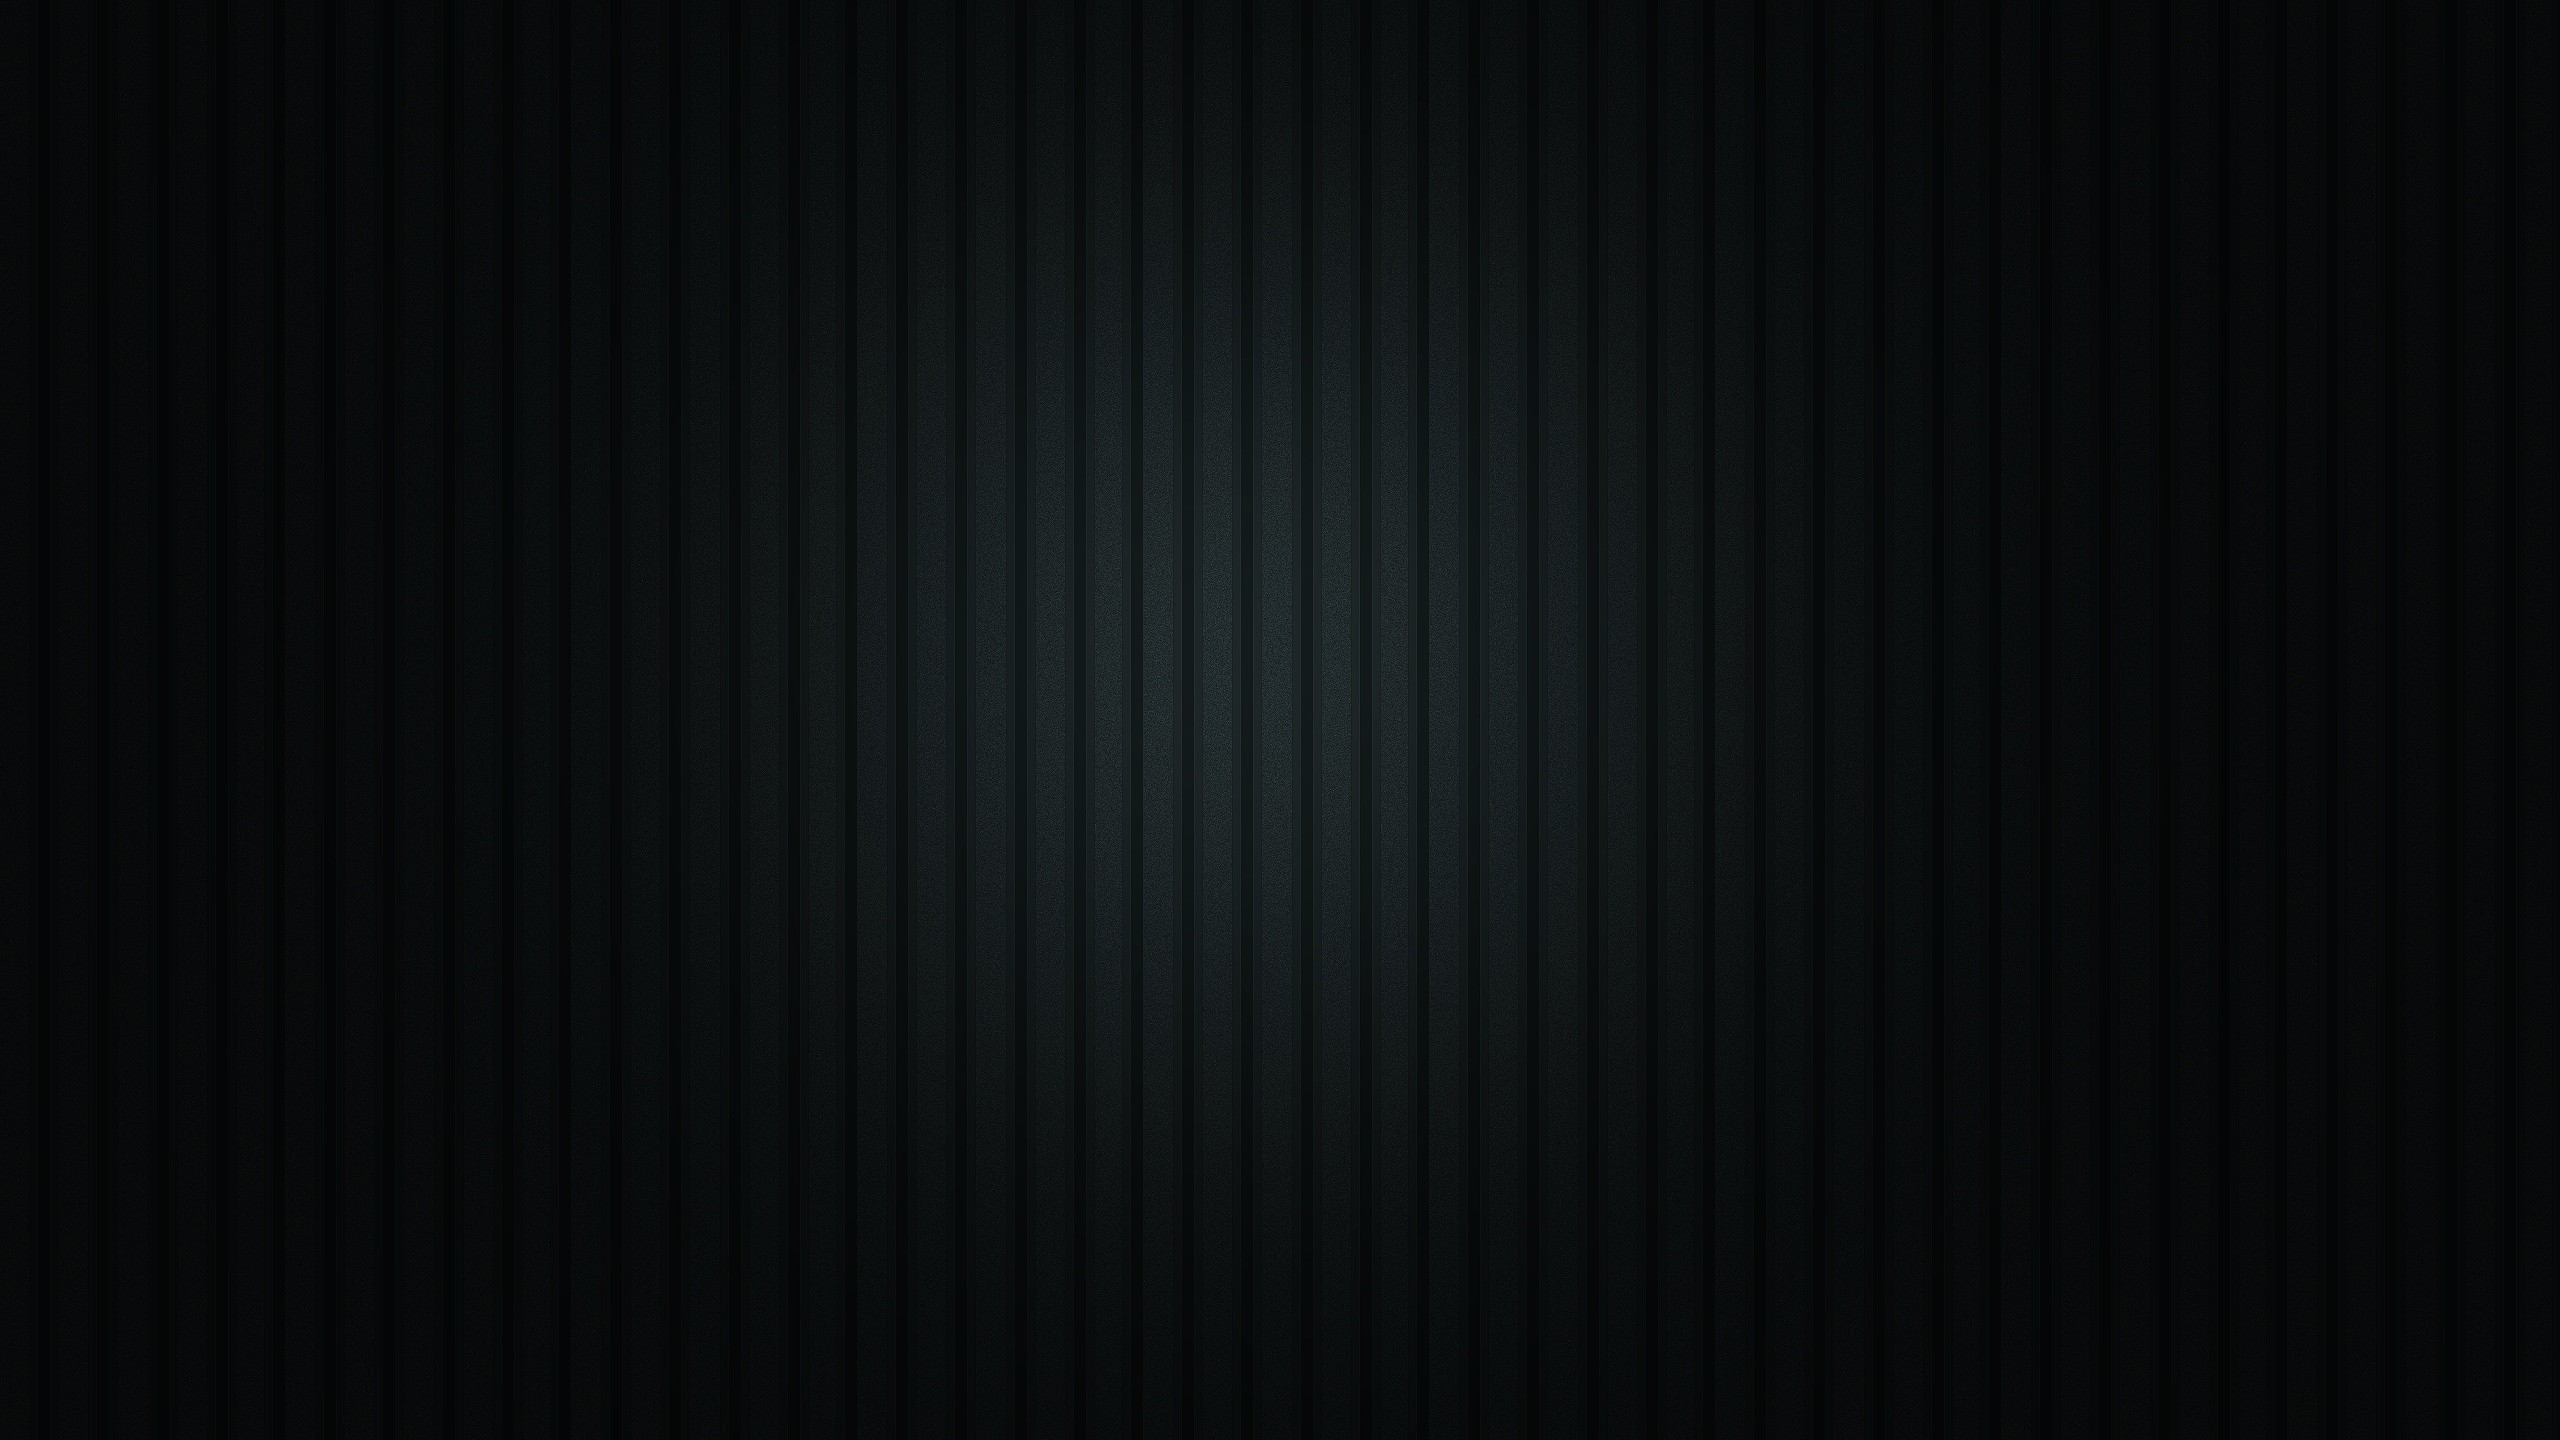 Plain Black Wallpaper Hd 2560 X 1440